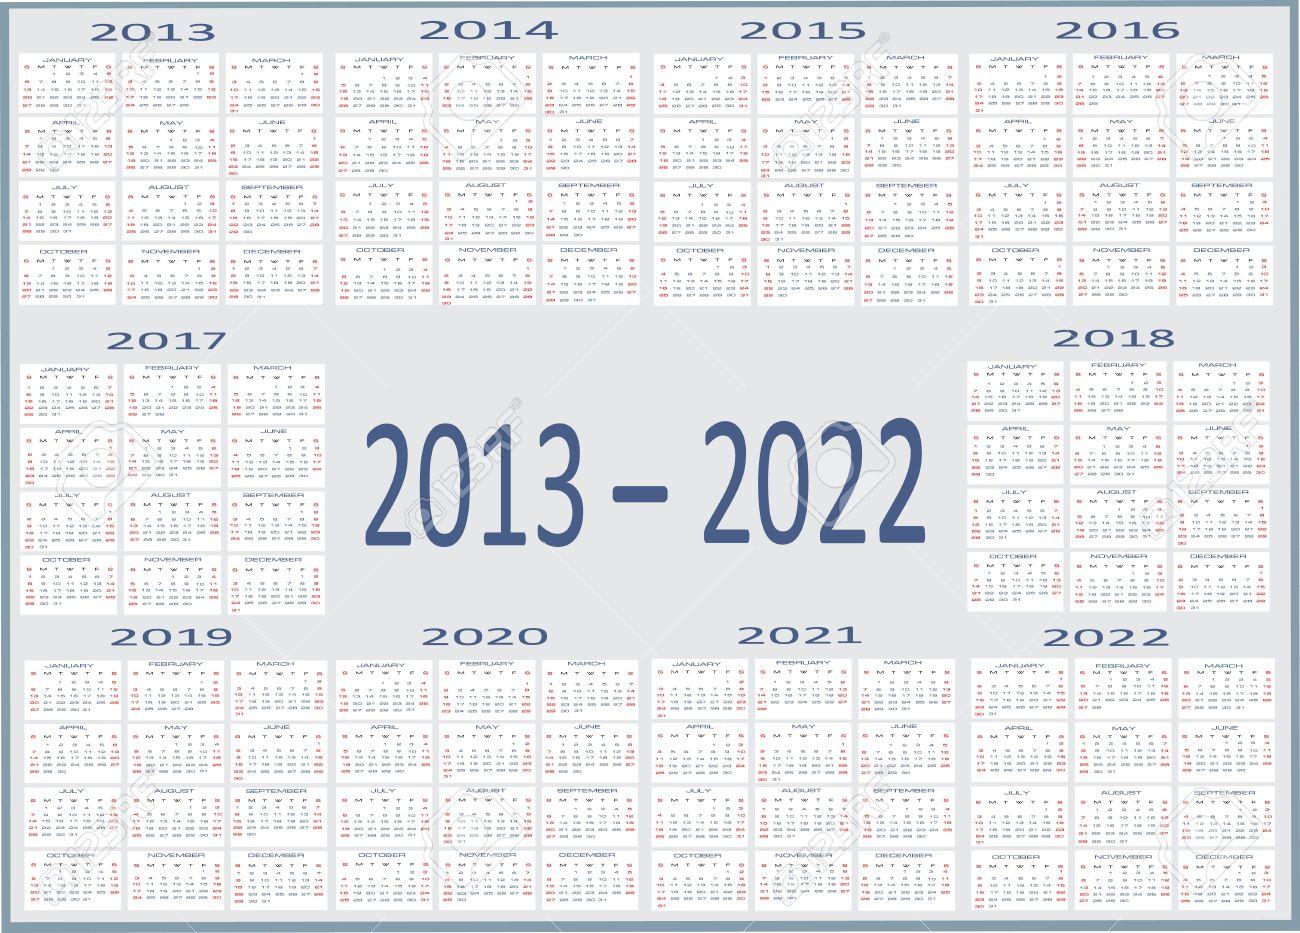 New Year 2013, 2014, 2015, 2016, 2017, 2018, 2019, 2020, 2021 ...